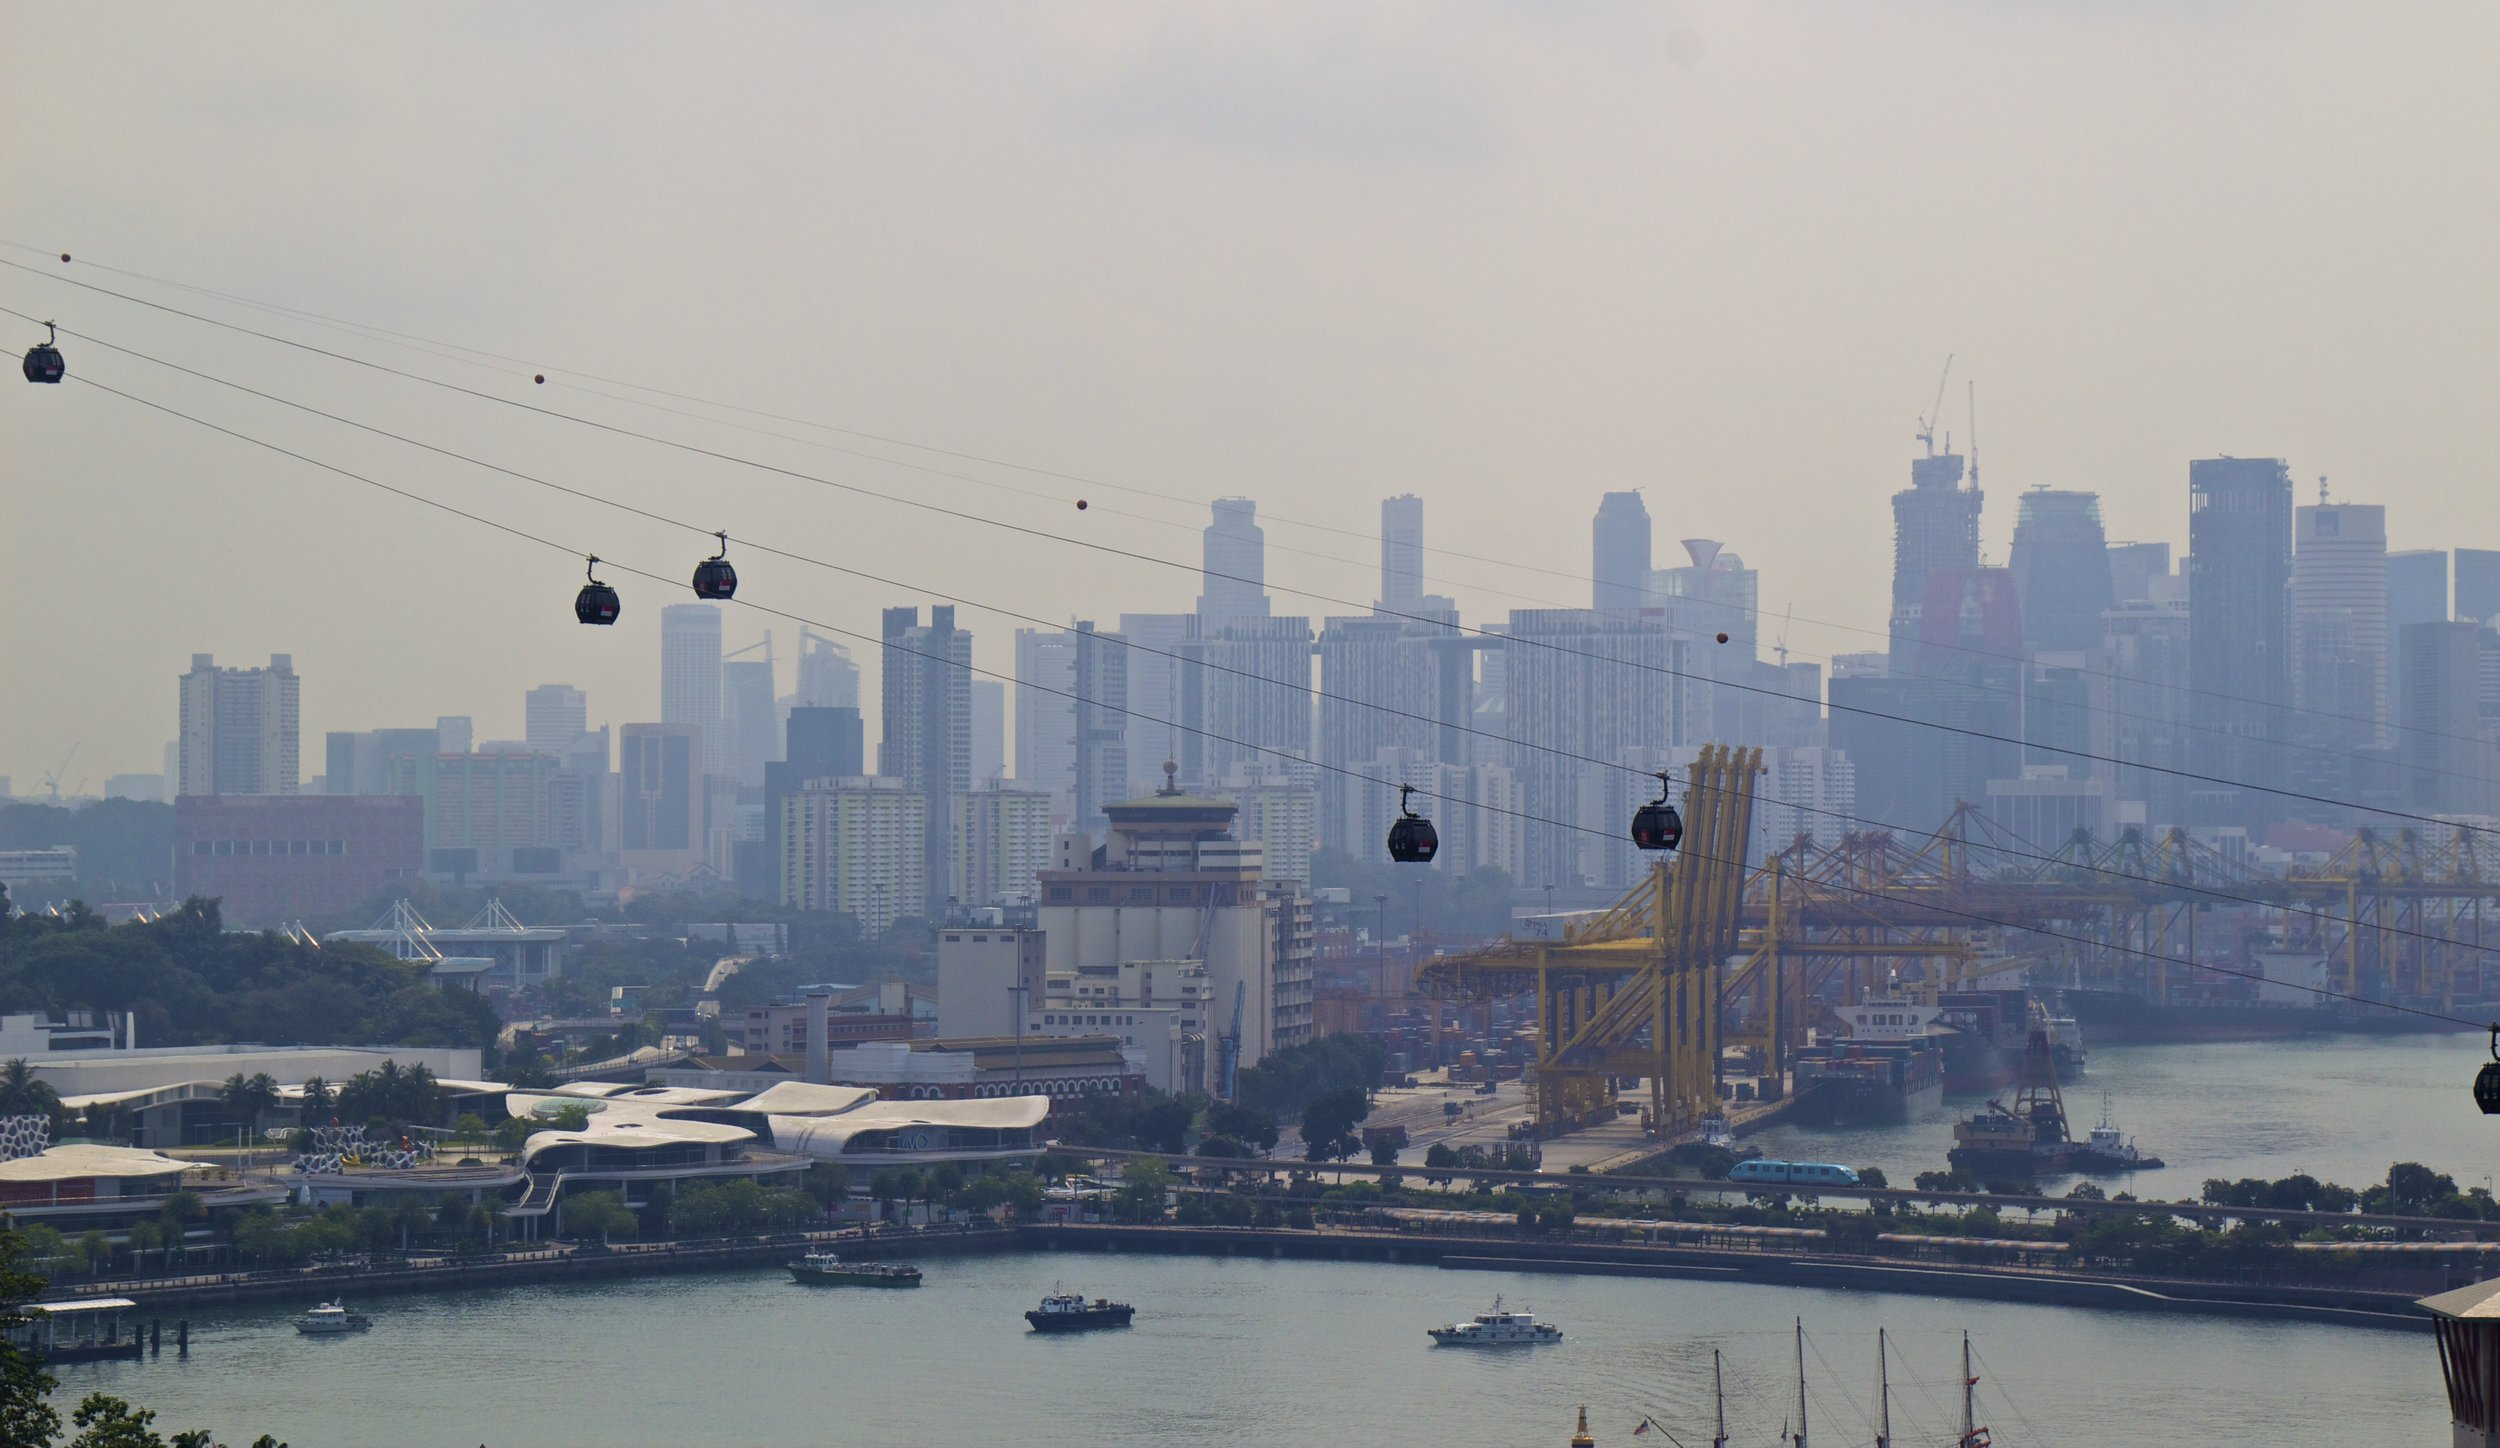 singapore sentosa cable cars 2.jpg